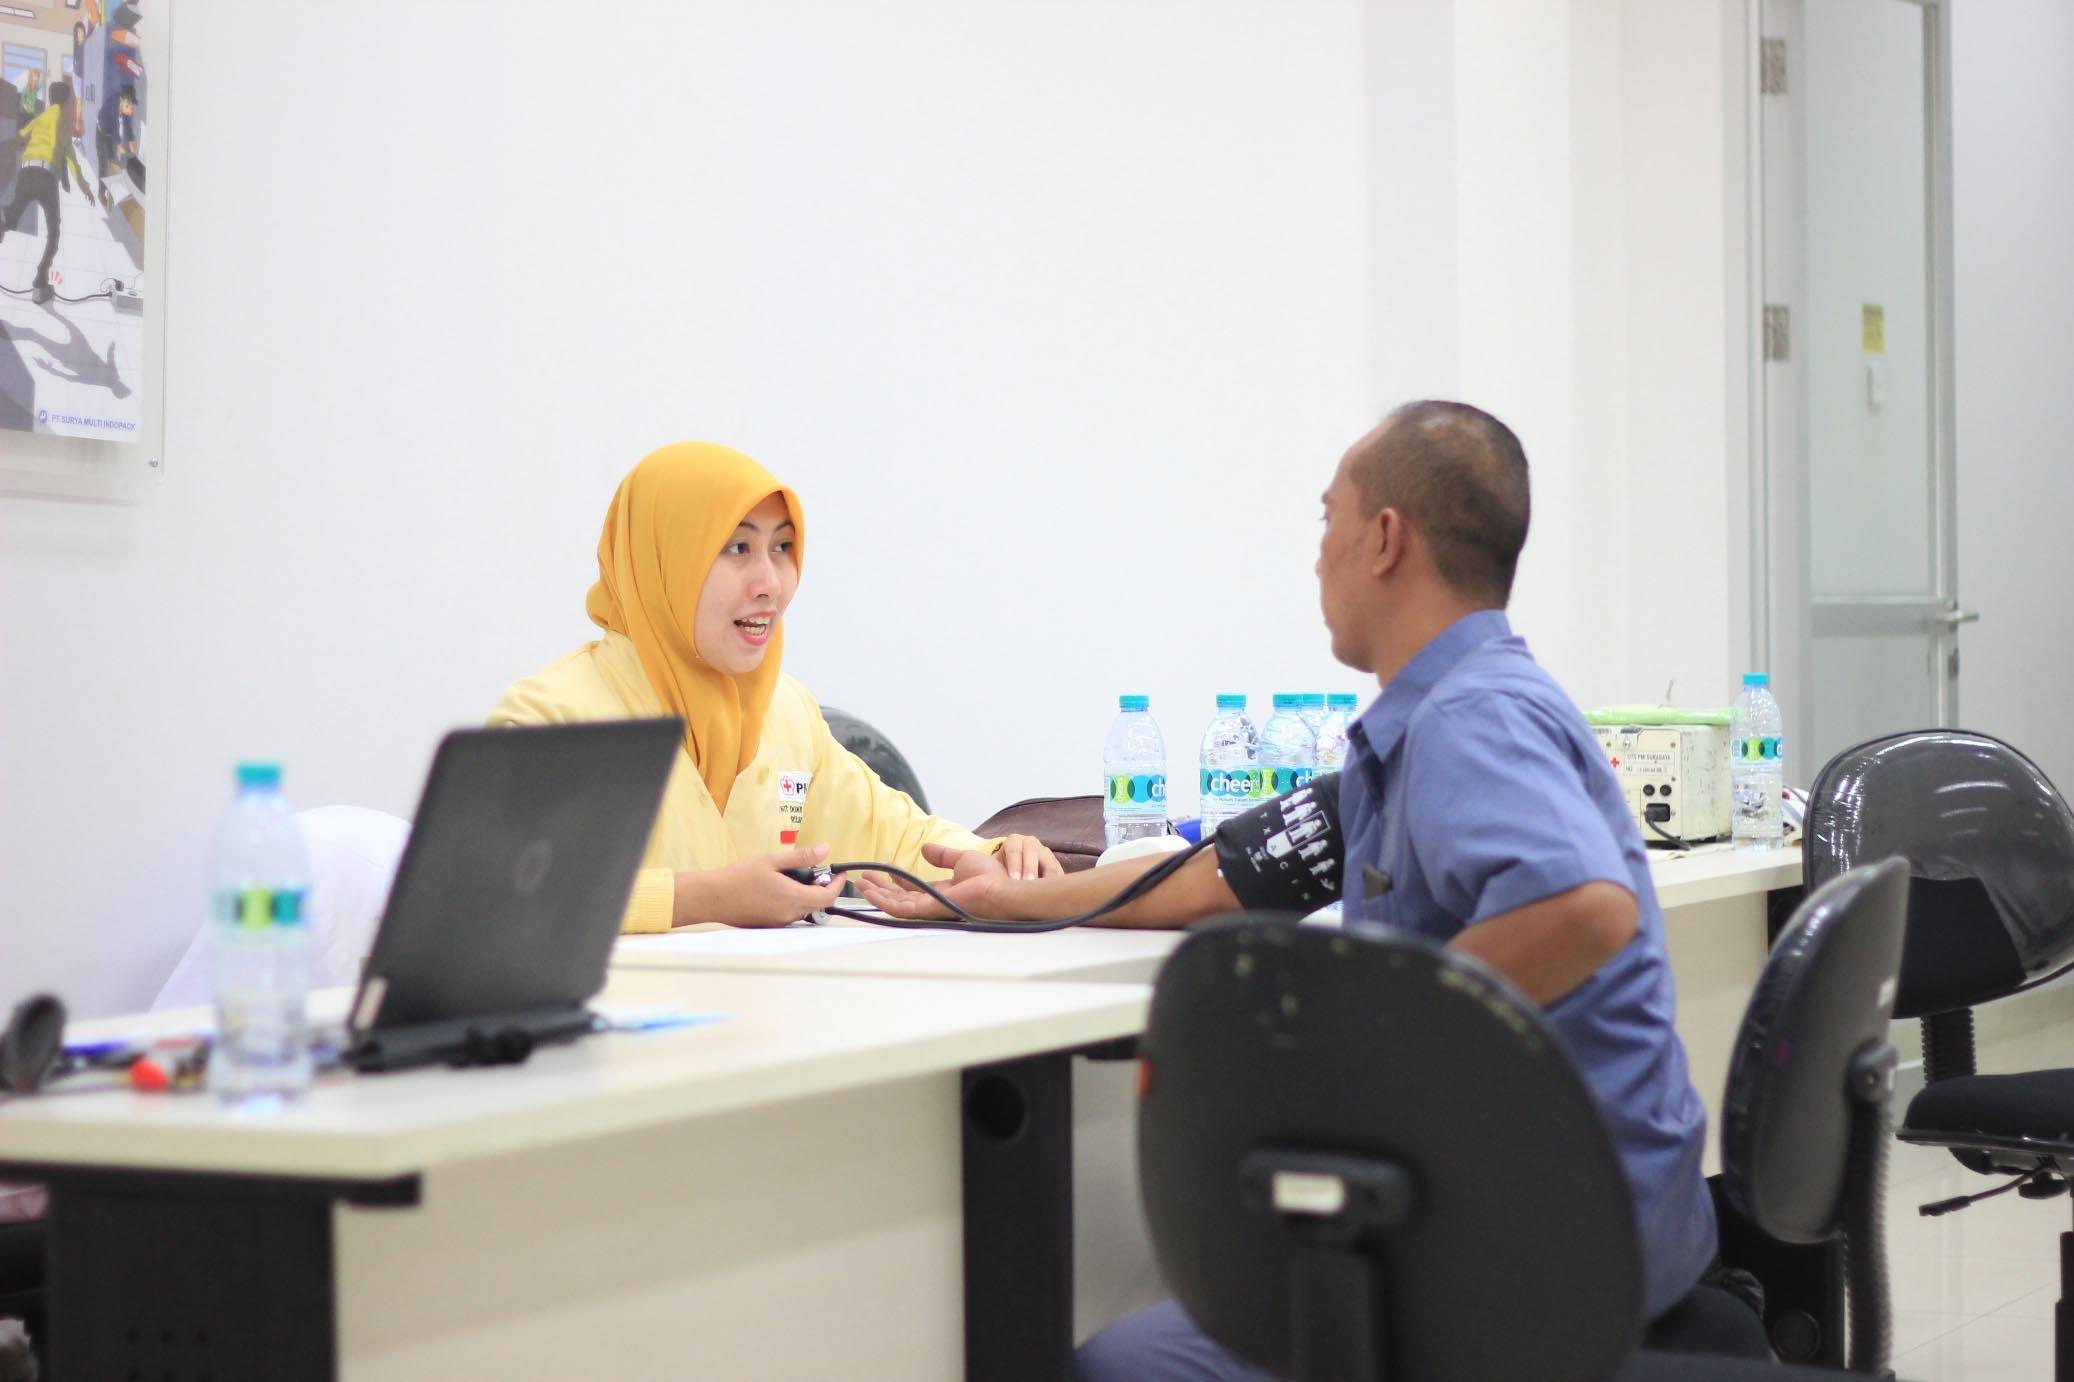 Packaging-Kemasan-Print-Produk-Cetak-Plastik-Food-Contoh-Buat-Pabrik-Surabaya-Donor-Darah-Gedangan-Plant-2